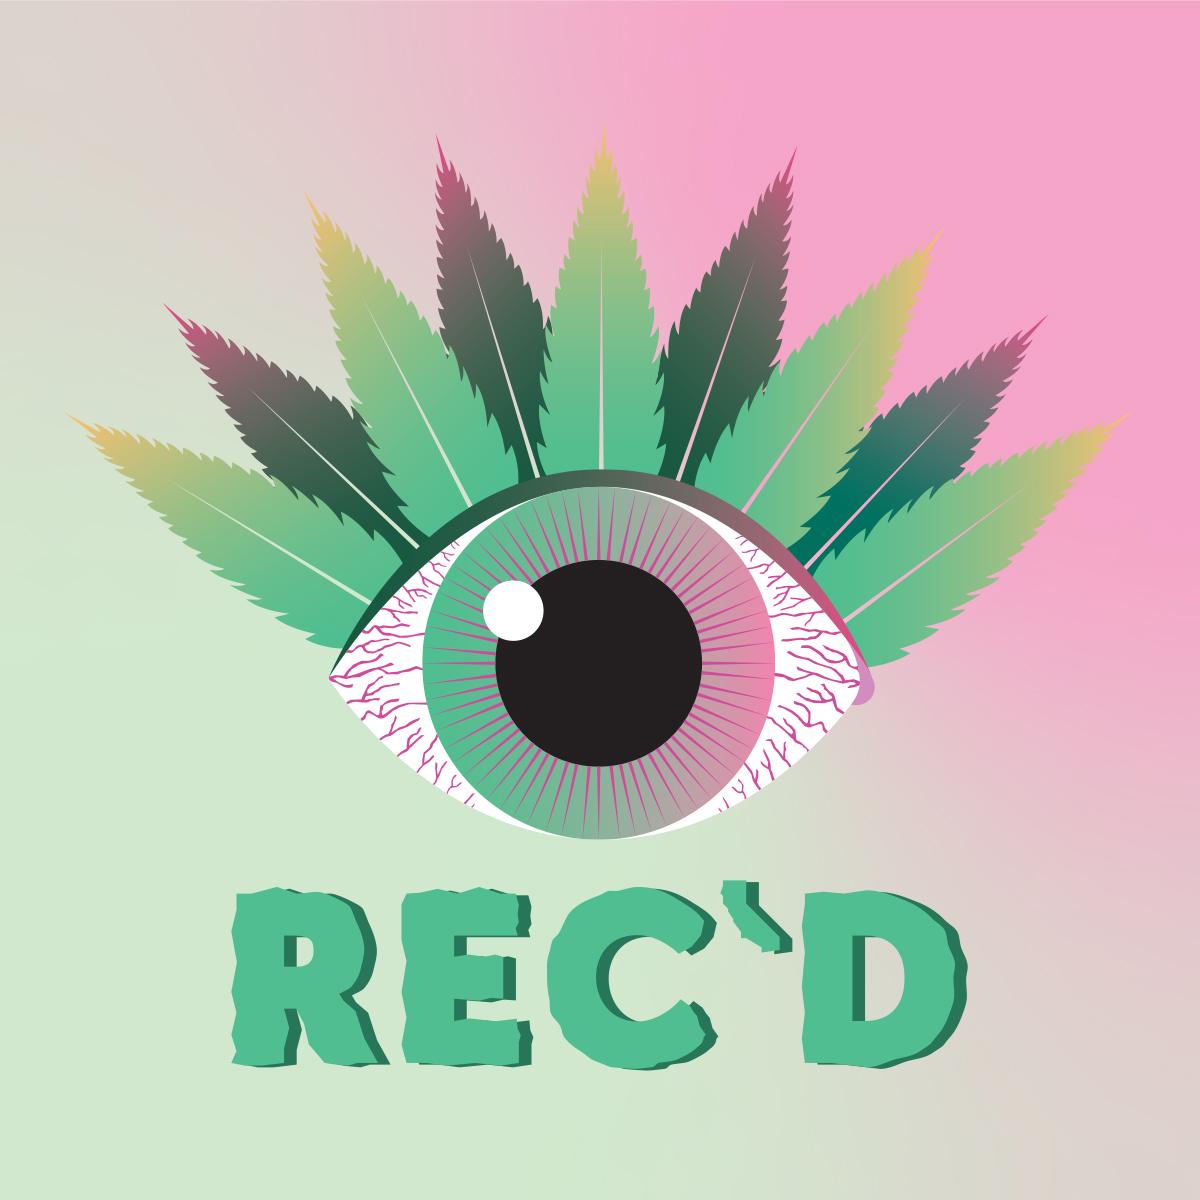 Recd_teaser_IG.jpg